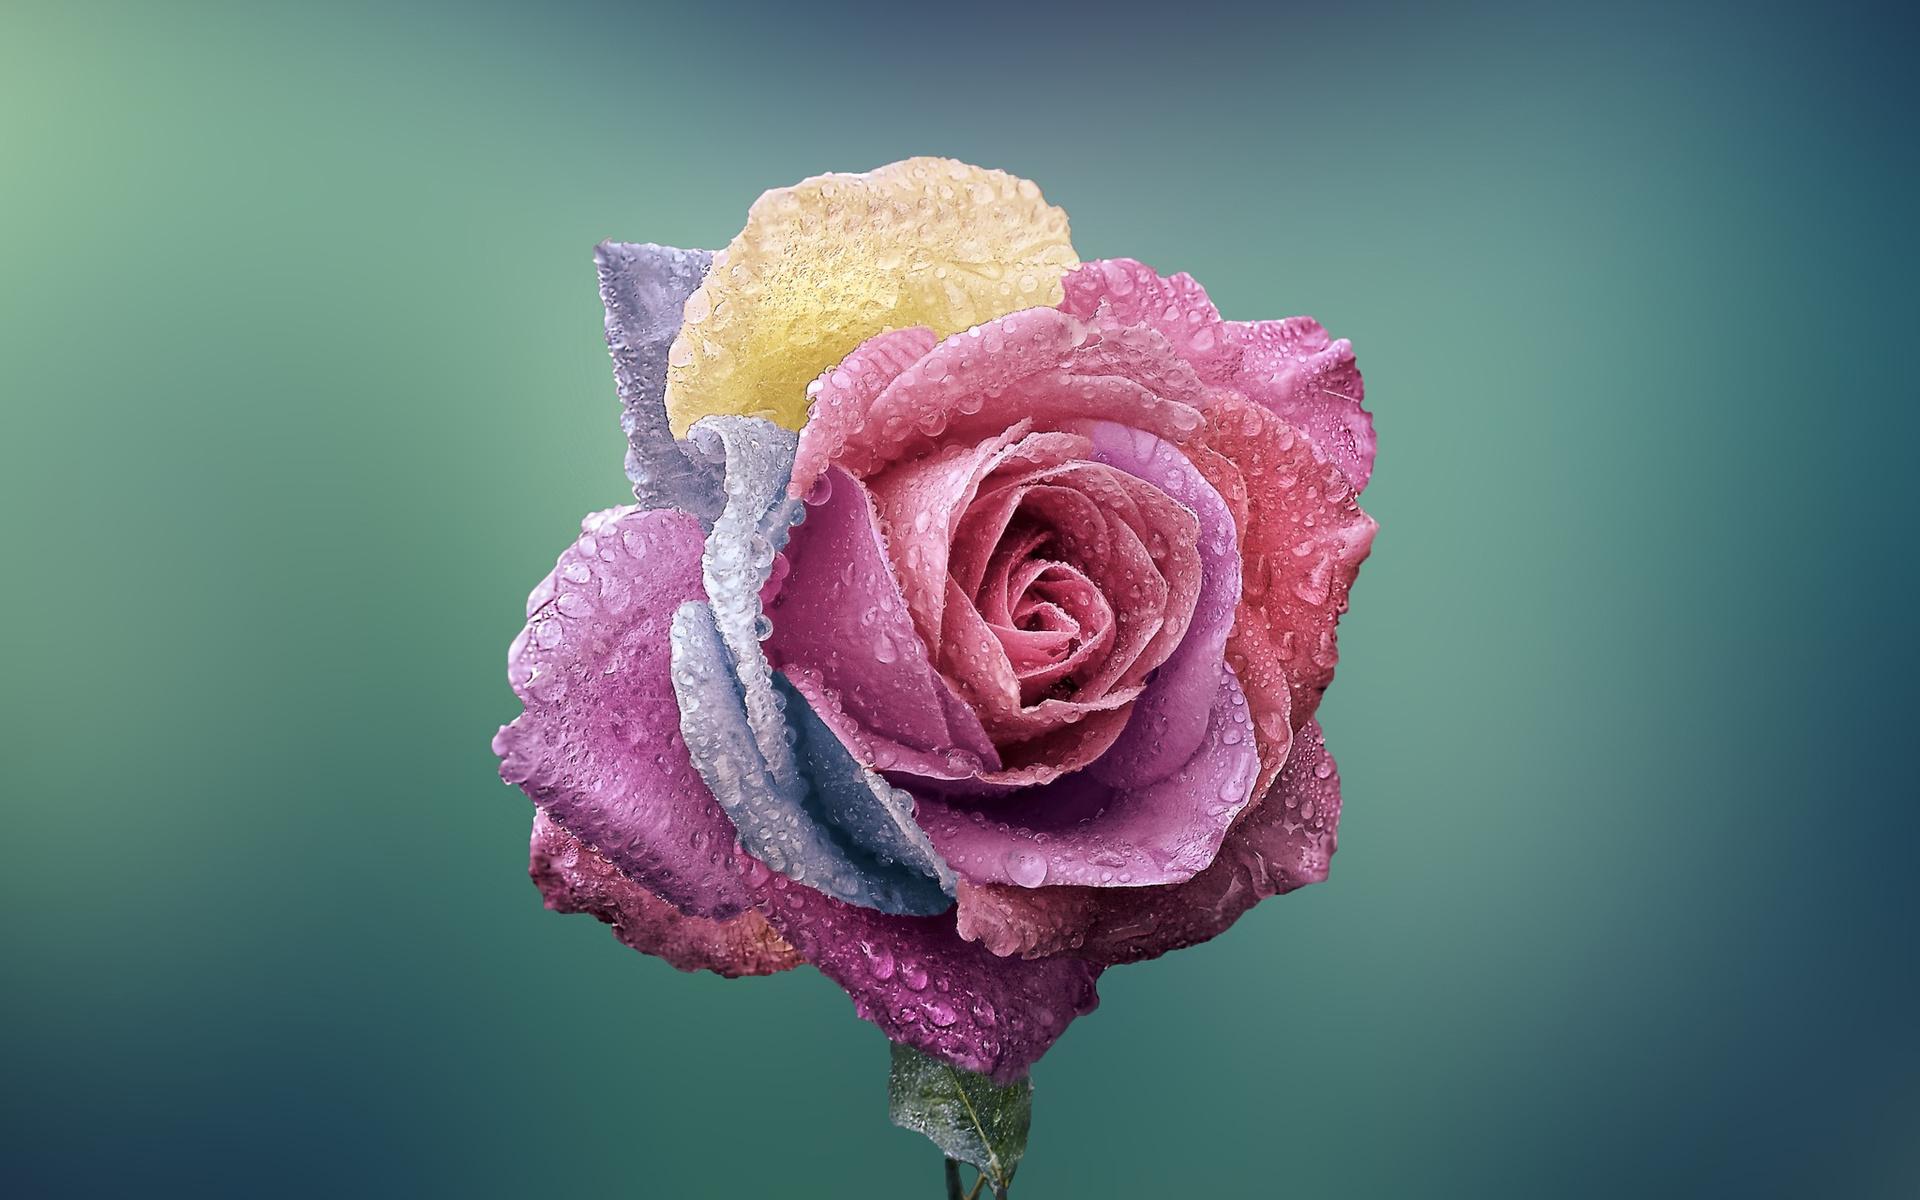 Деда мороз, картинка с розой